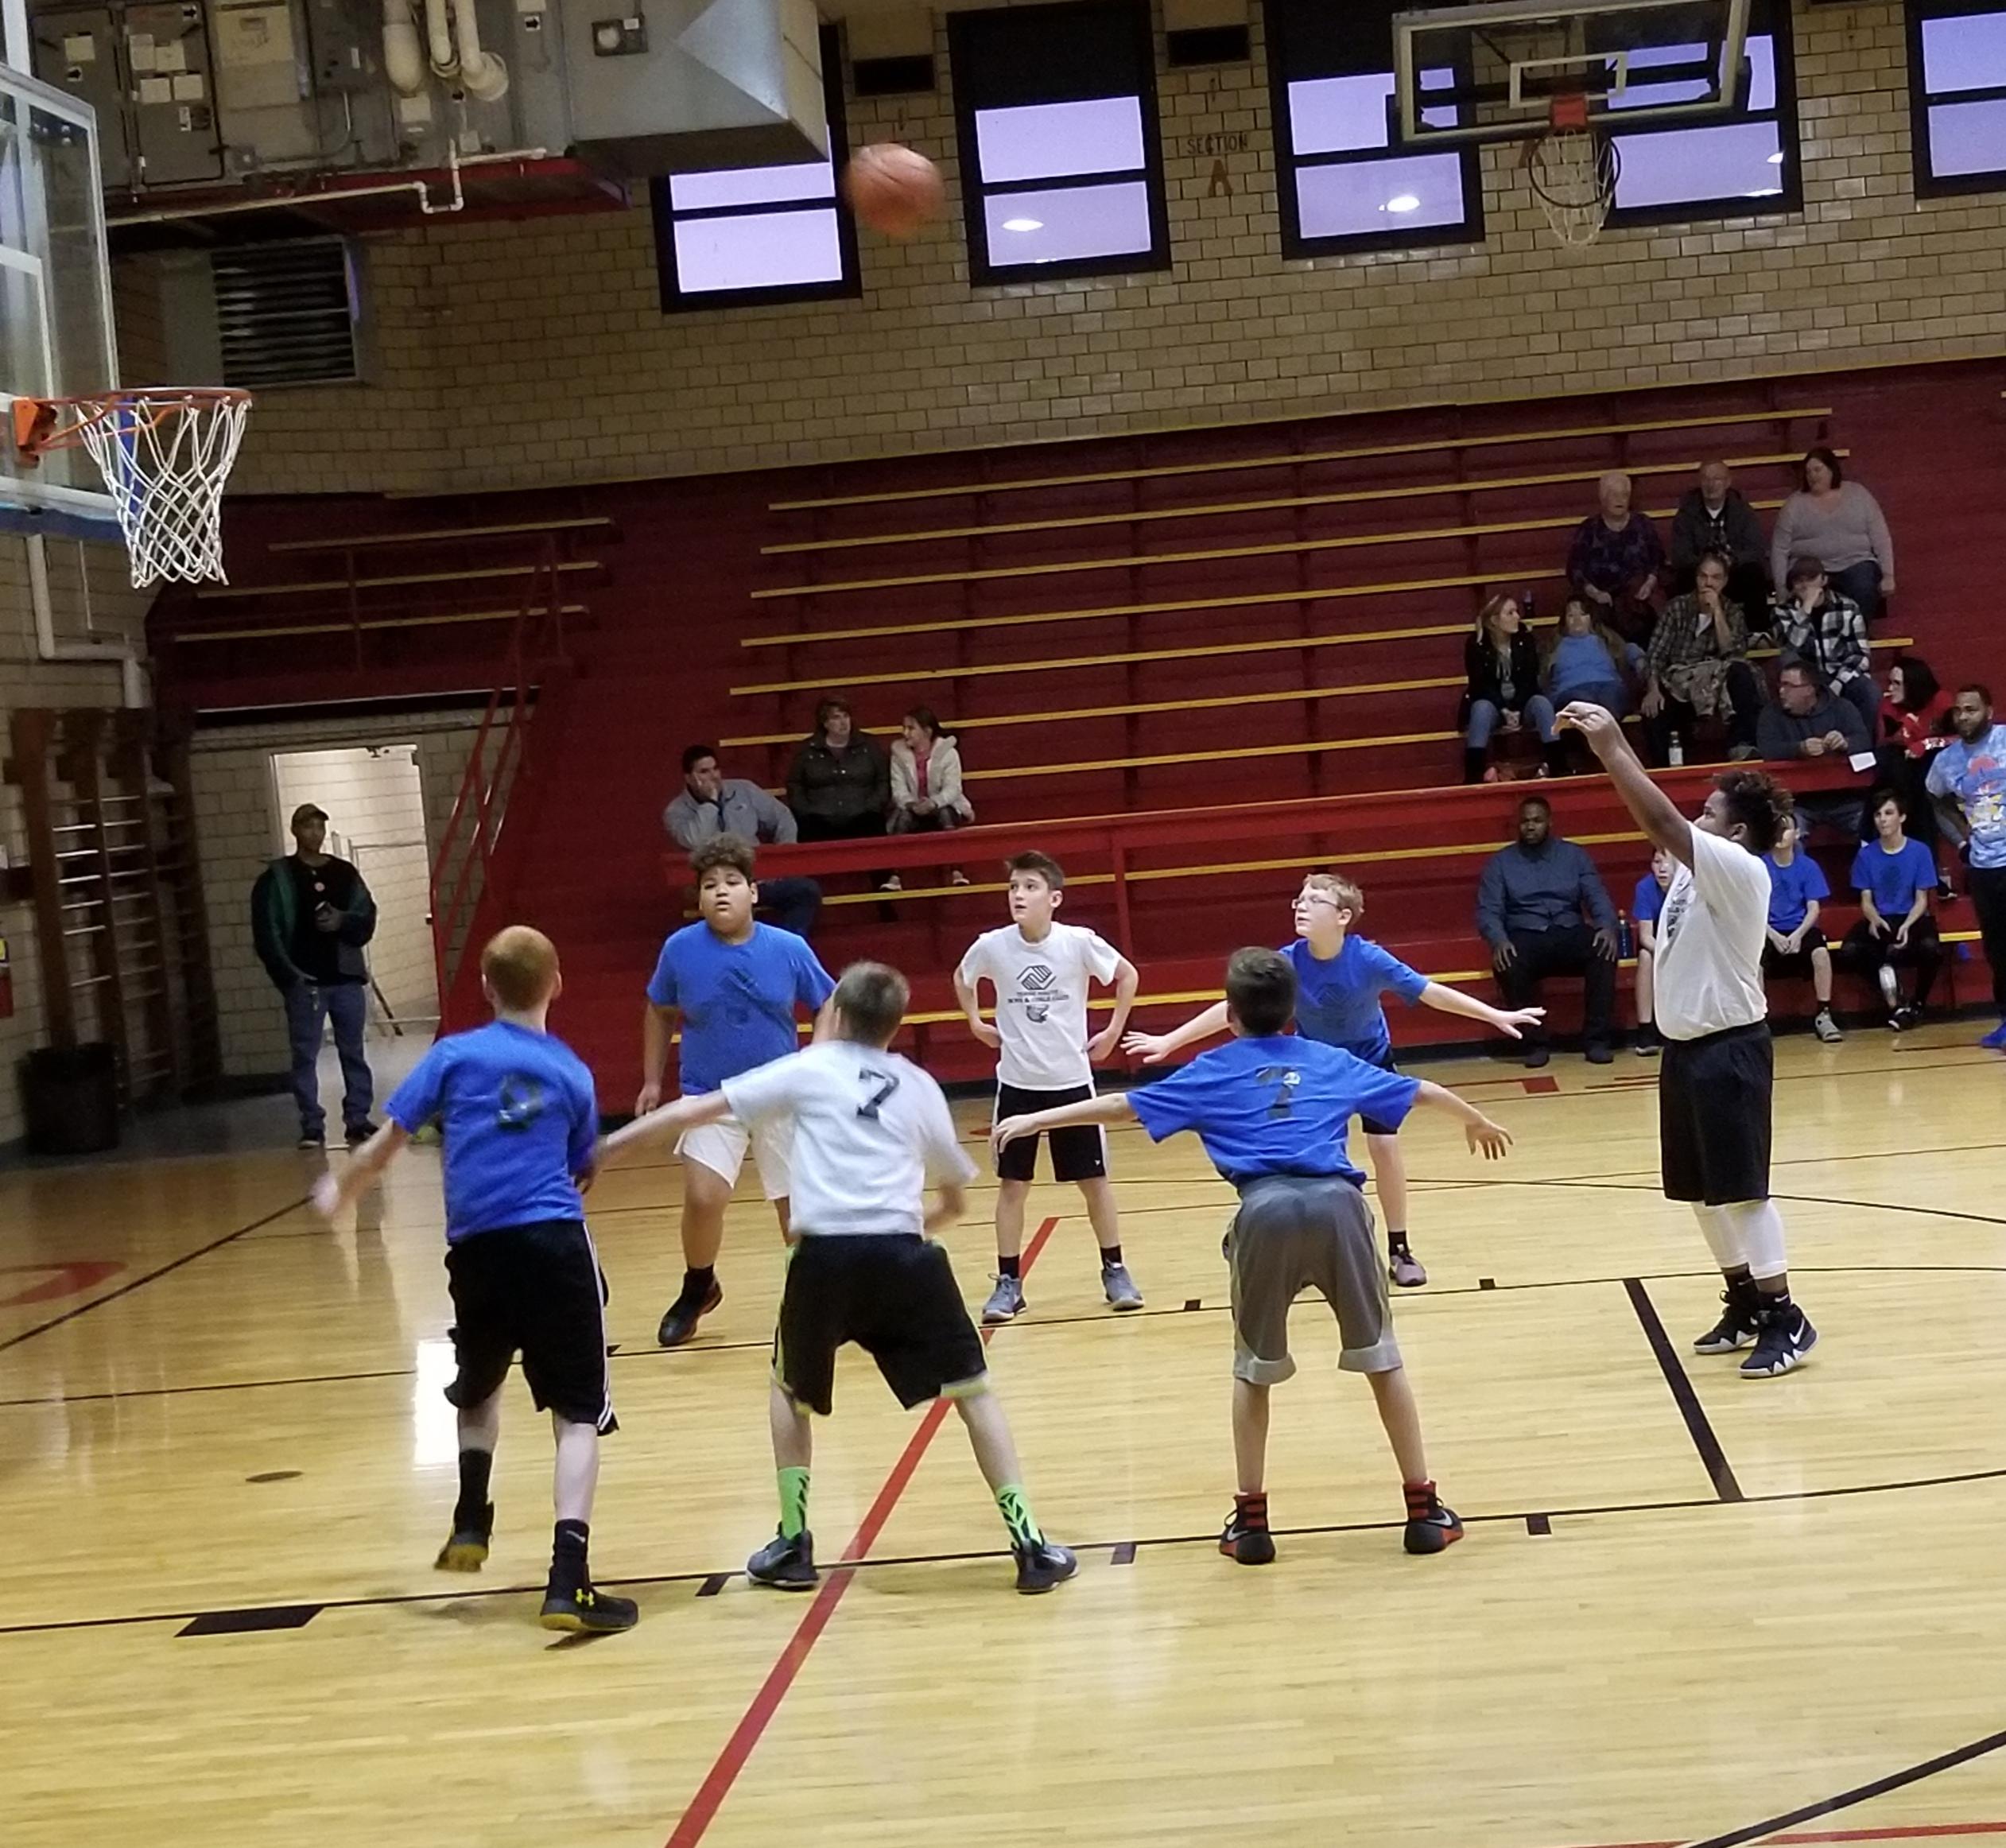 Terre Haute Boys Girls Club Sports Our Sports Basketball